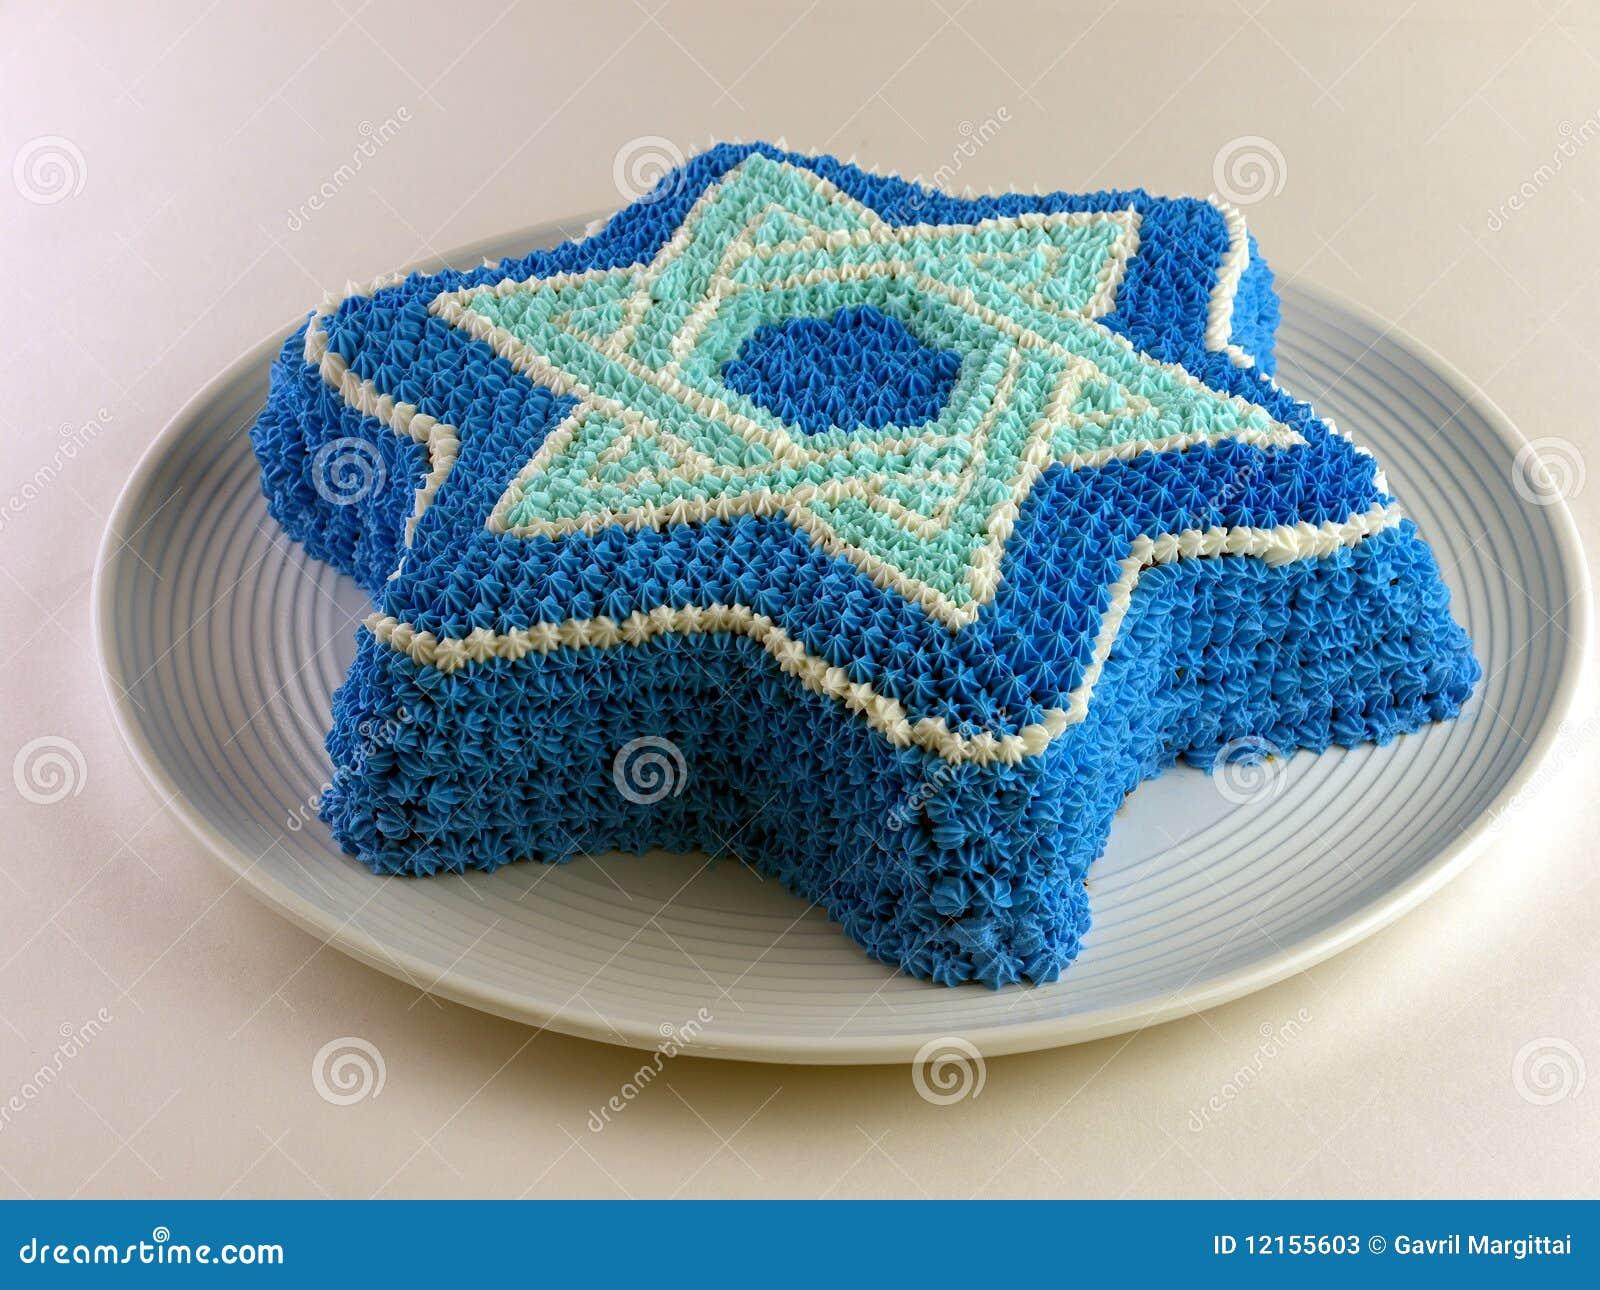 David S  Star Cake